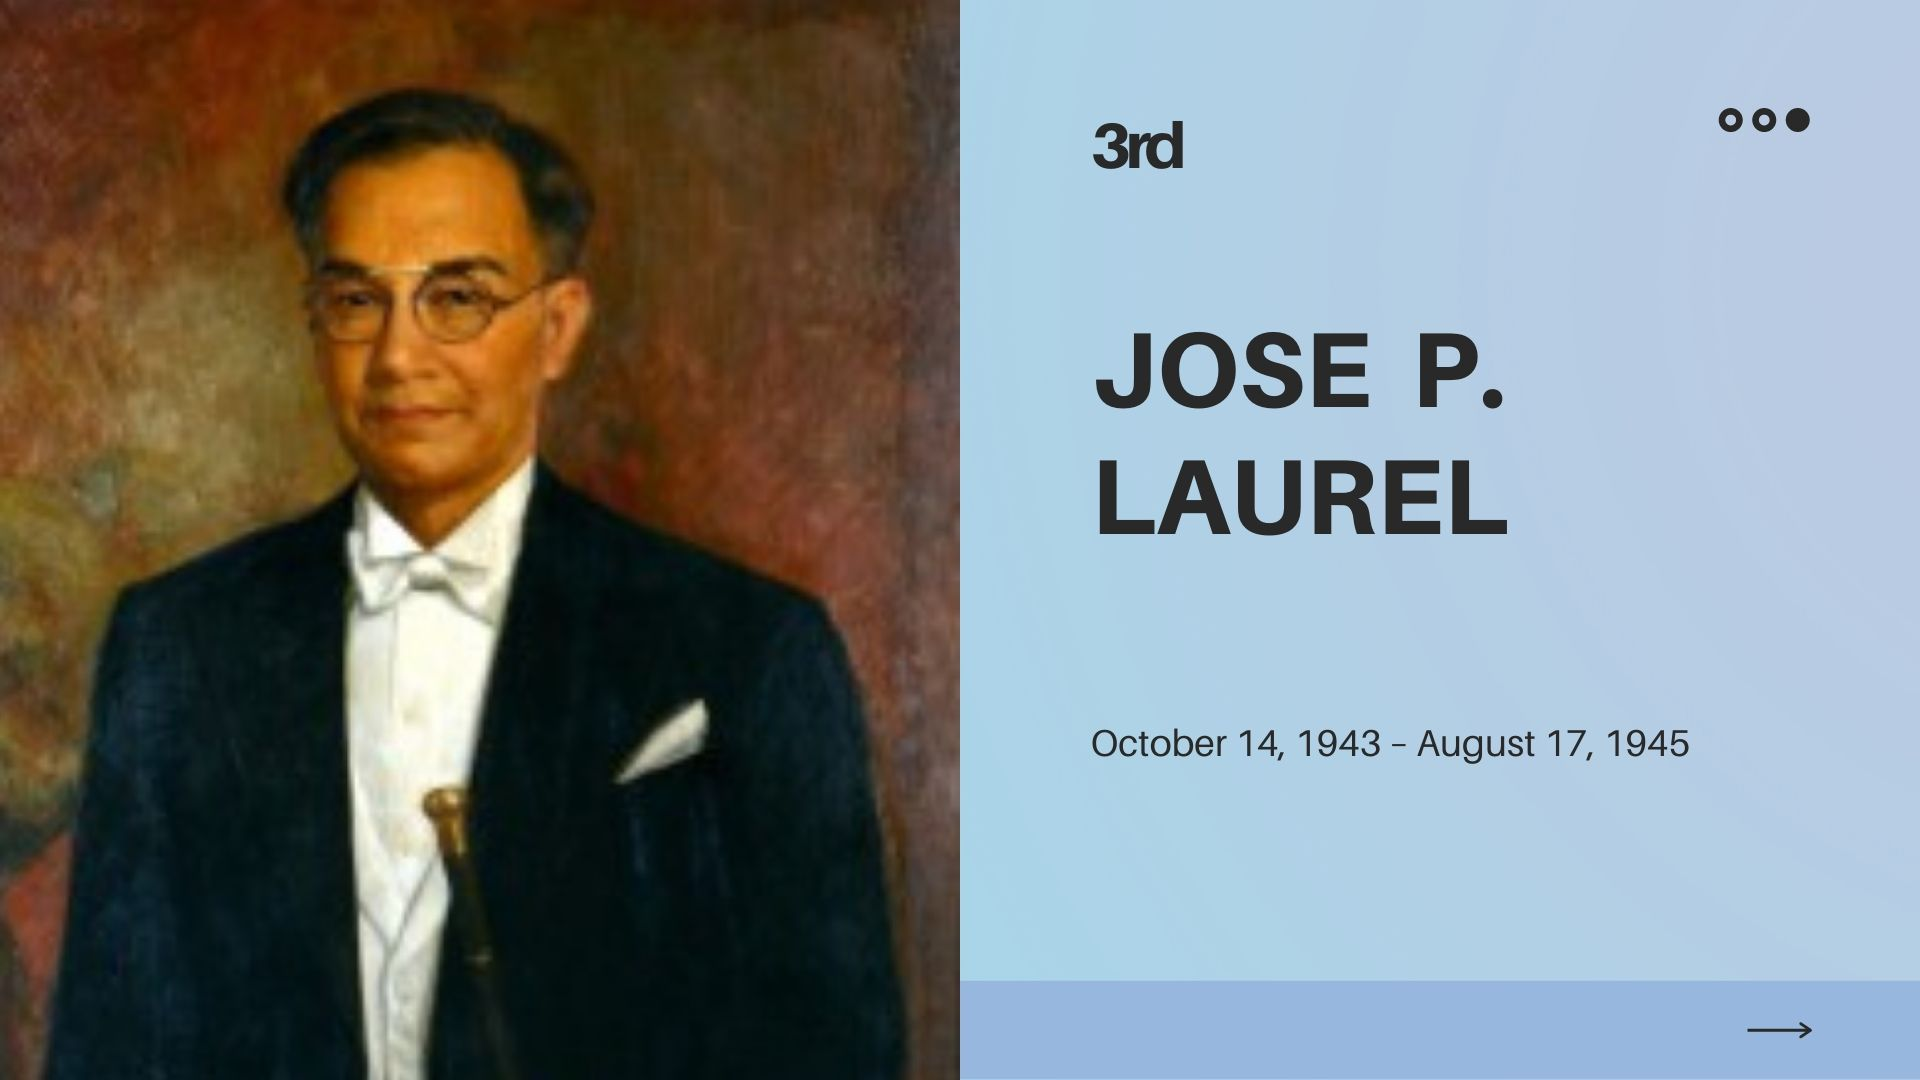 president jose p laurel achievements and contributions